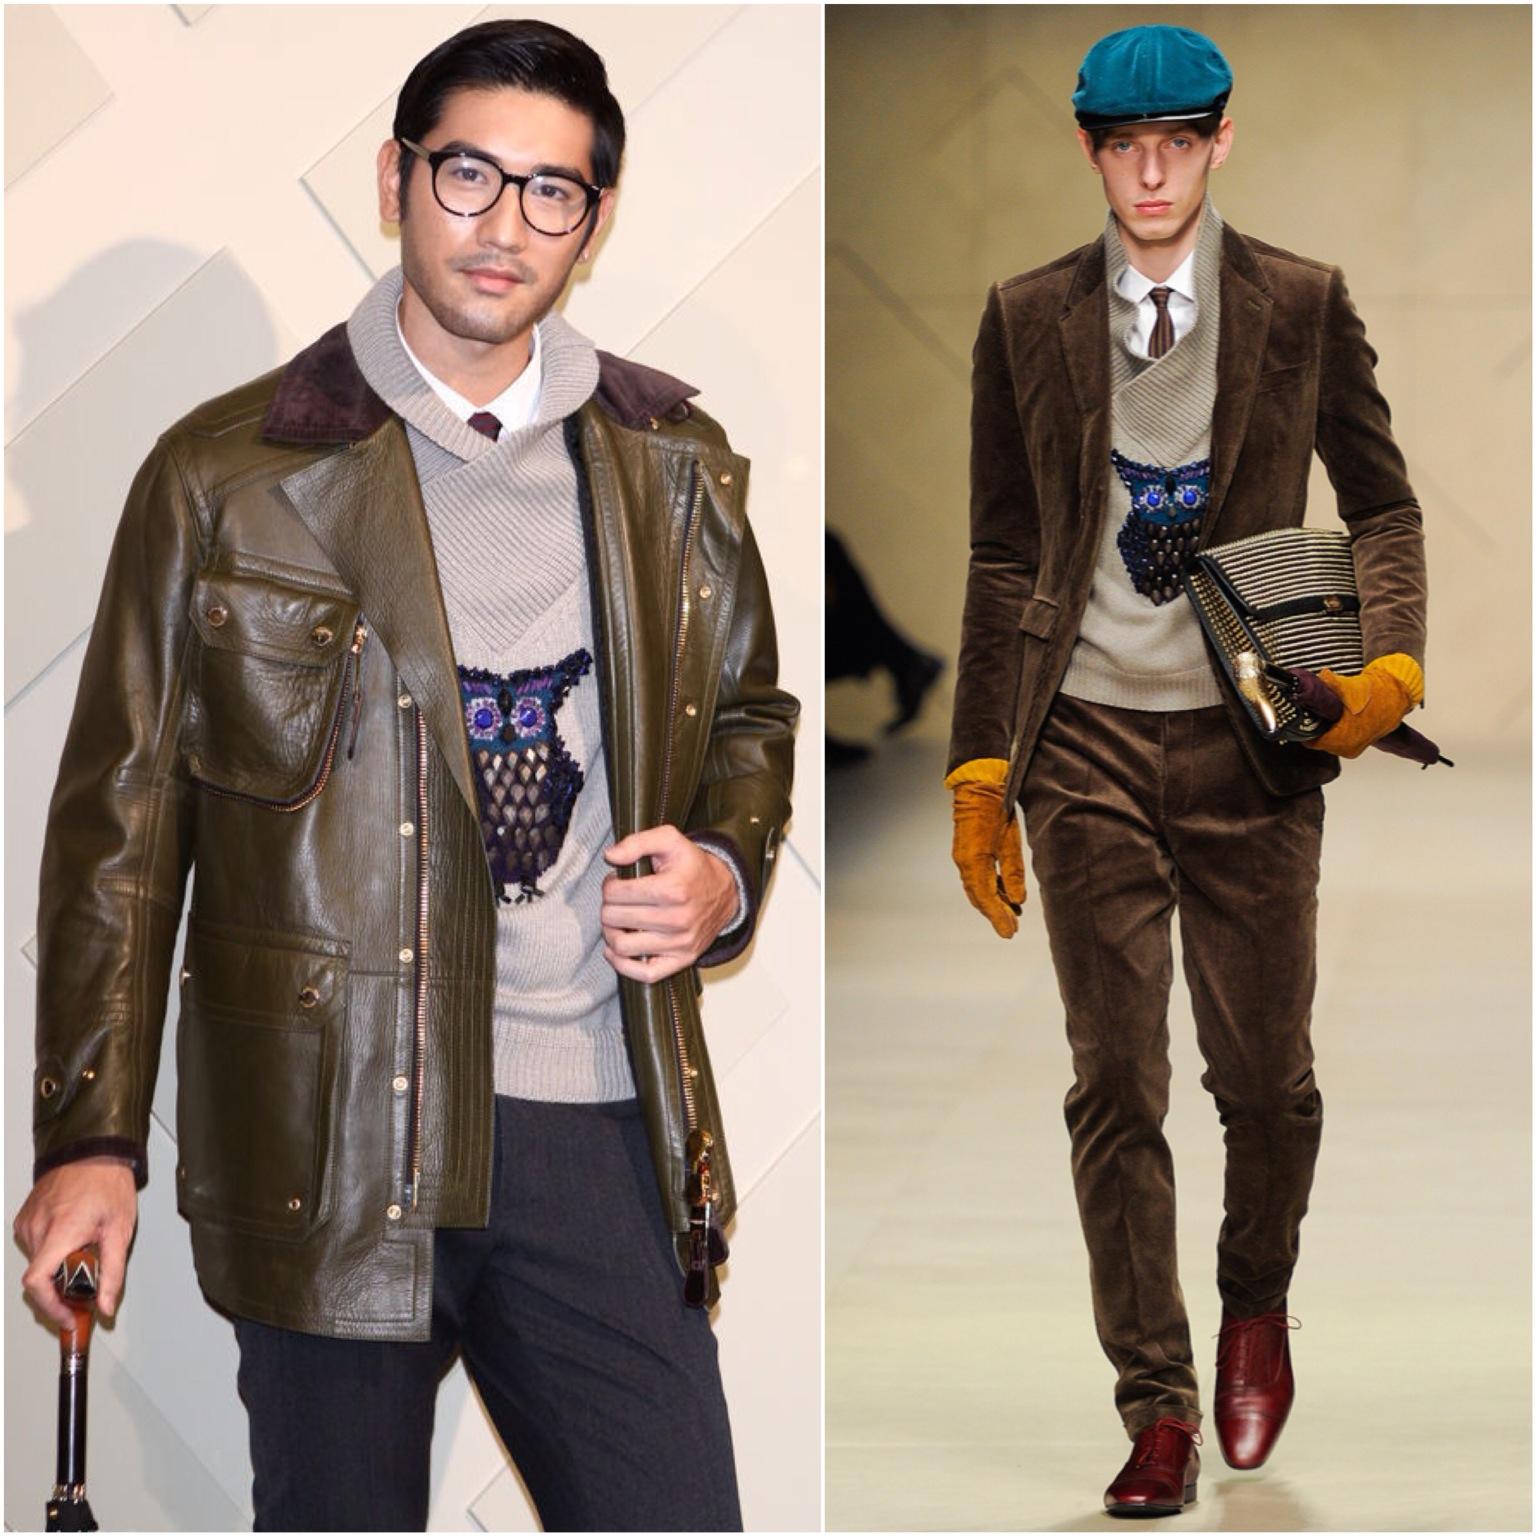 00O00 London Menswear Blog Celebrity Style 高以翔出席 Burberry Prorsum 精品店开幕 Godfrey Gao in Burberry Prorsum